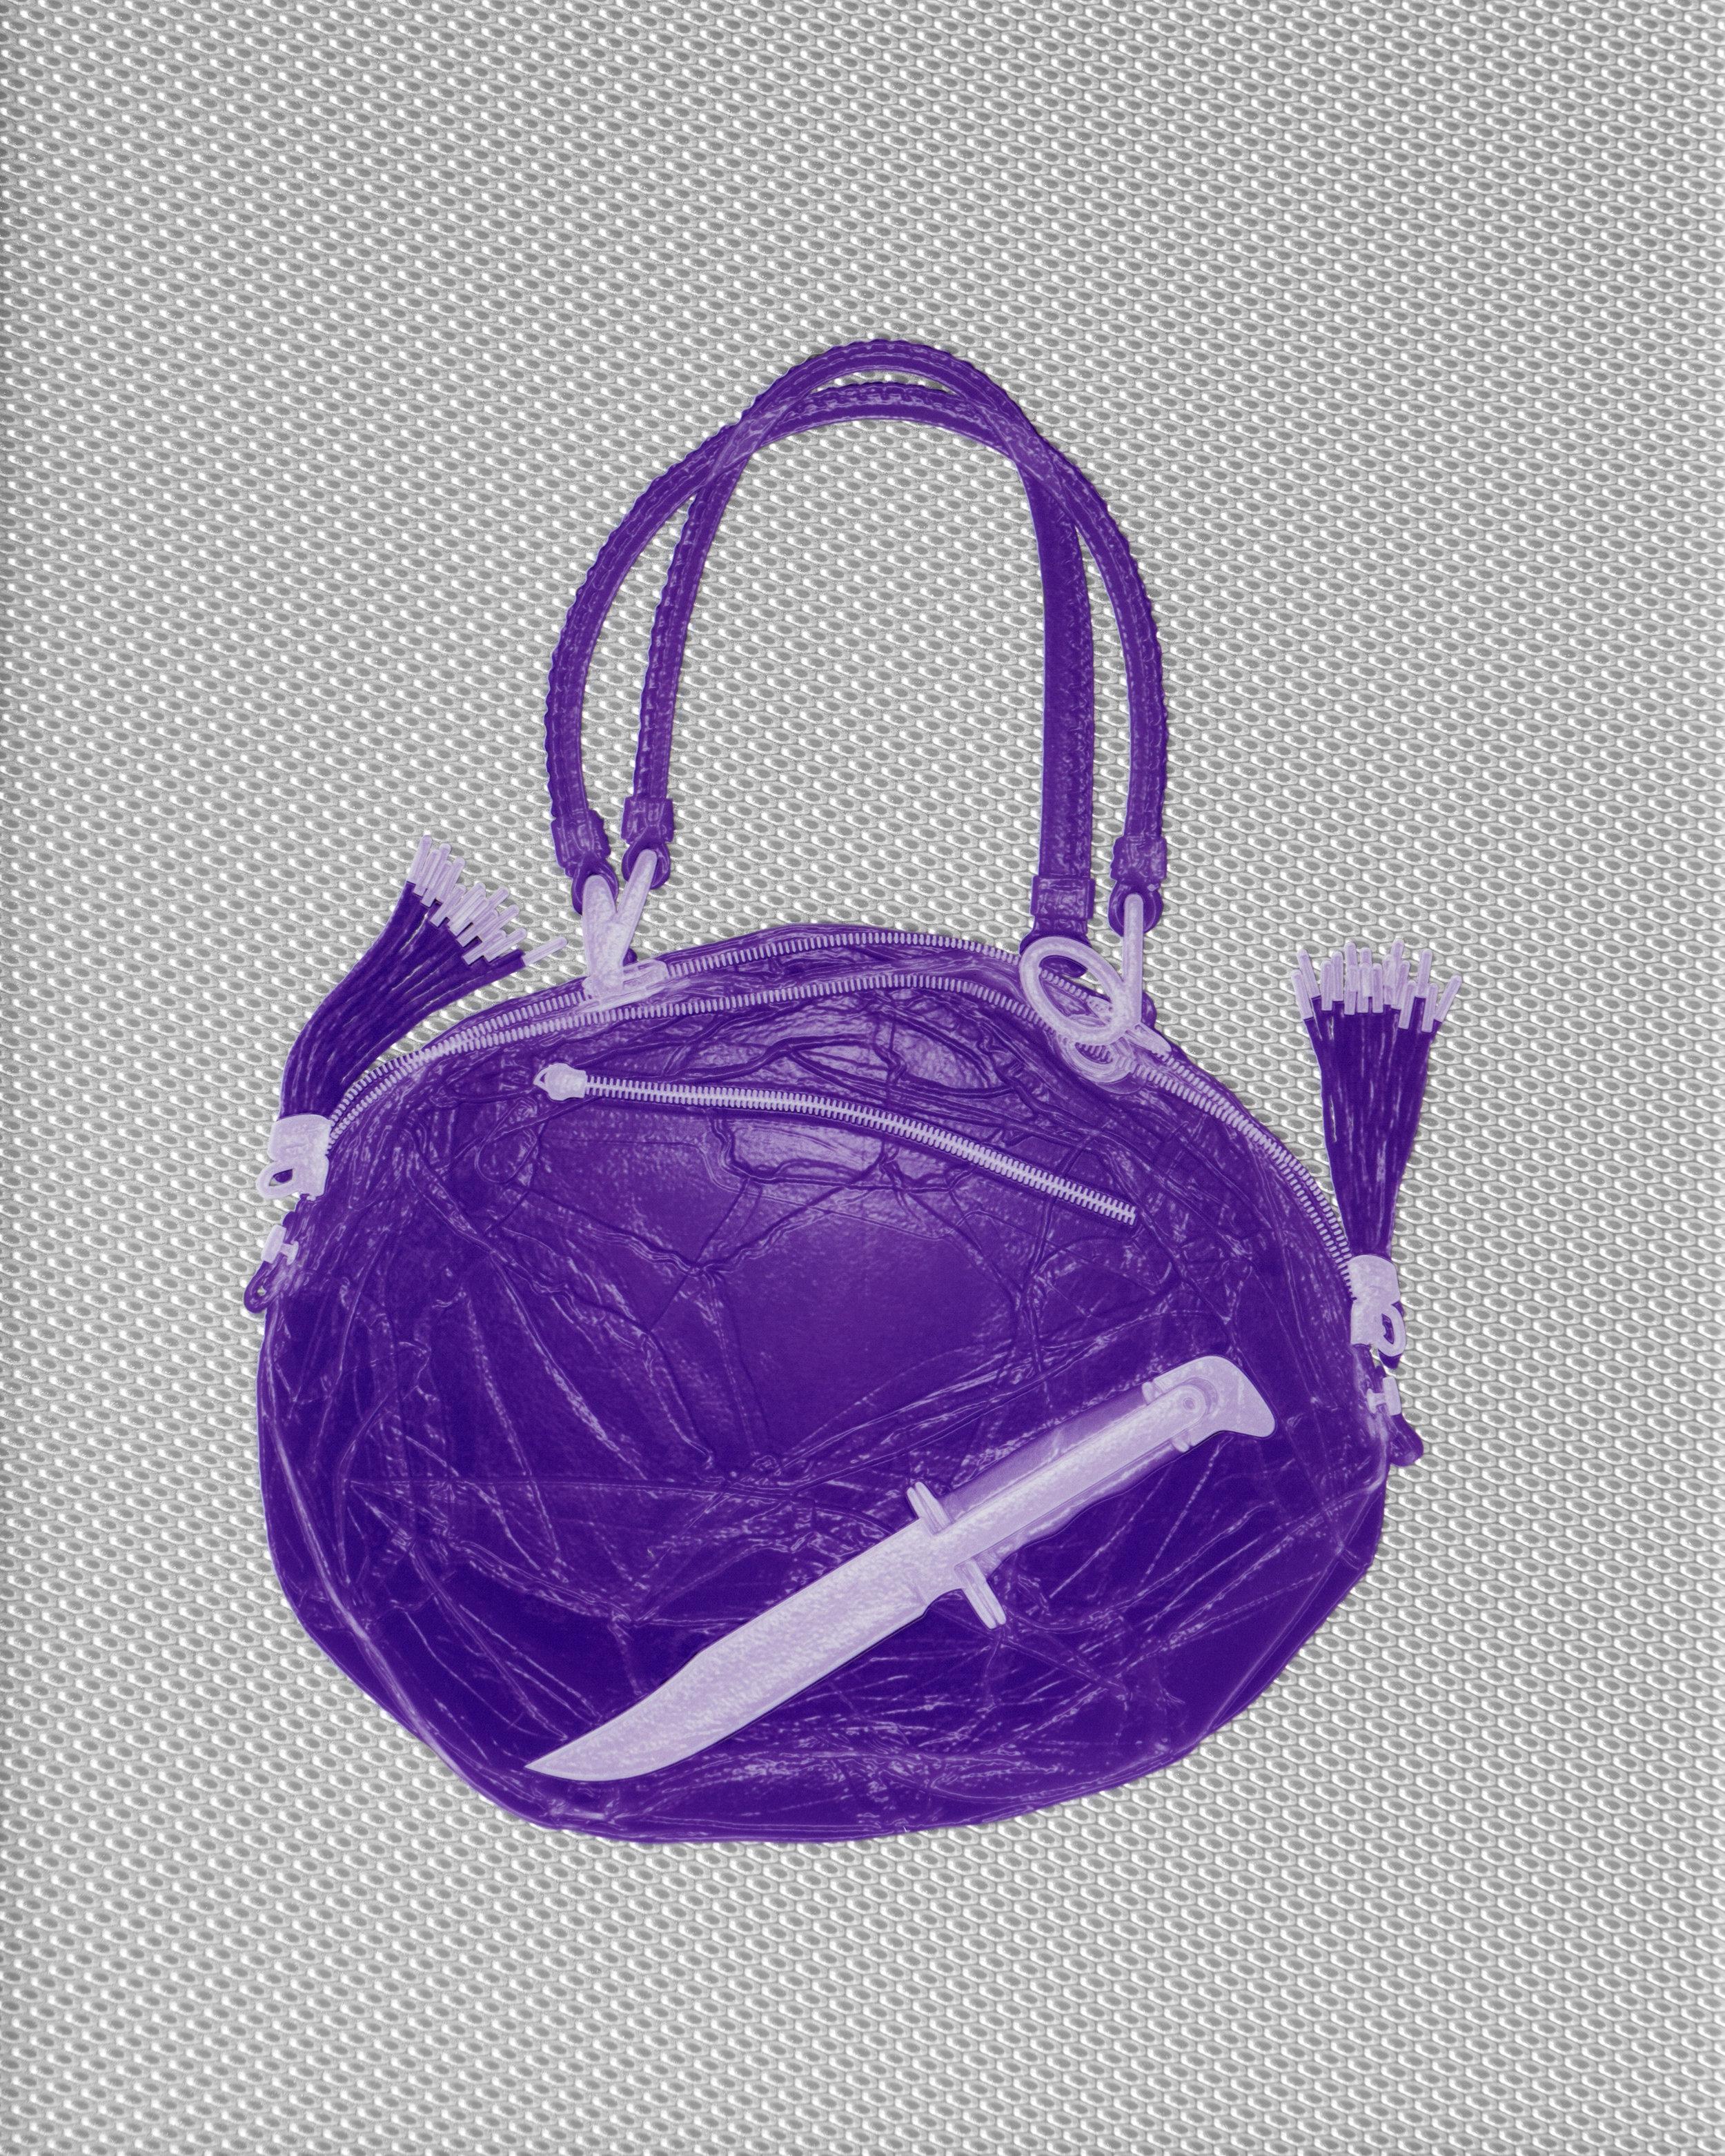 Purple Bikkemberg Handbag With Knife